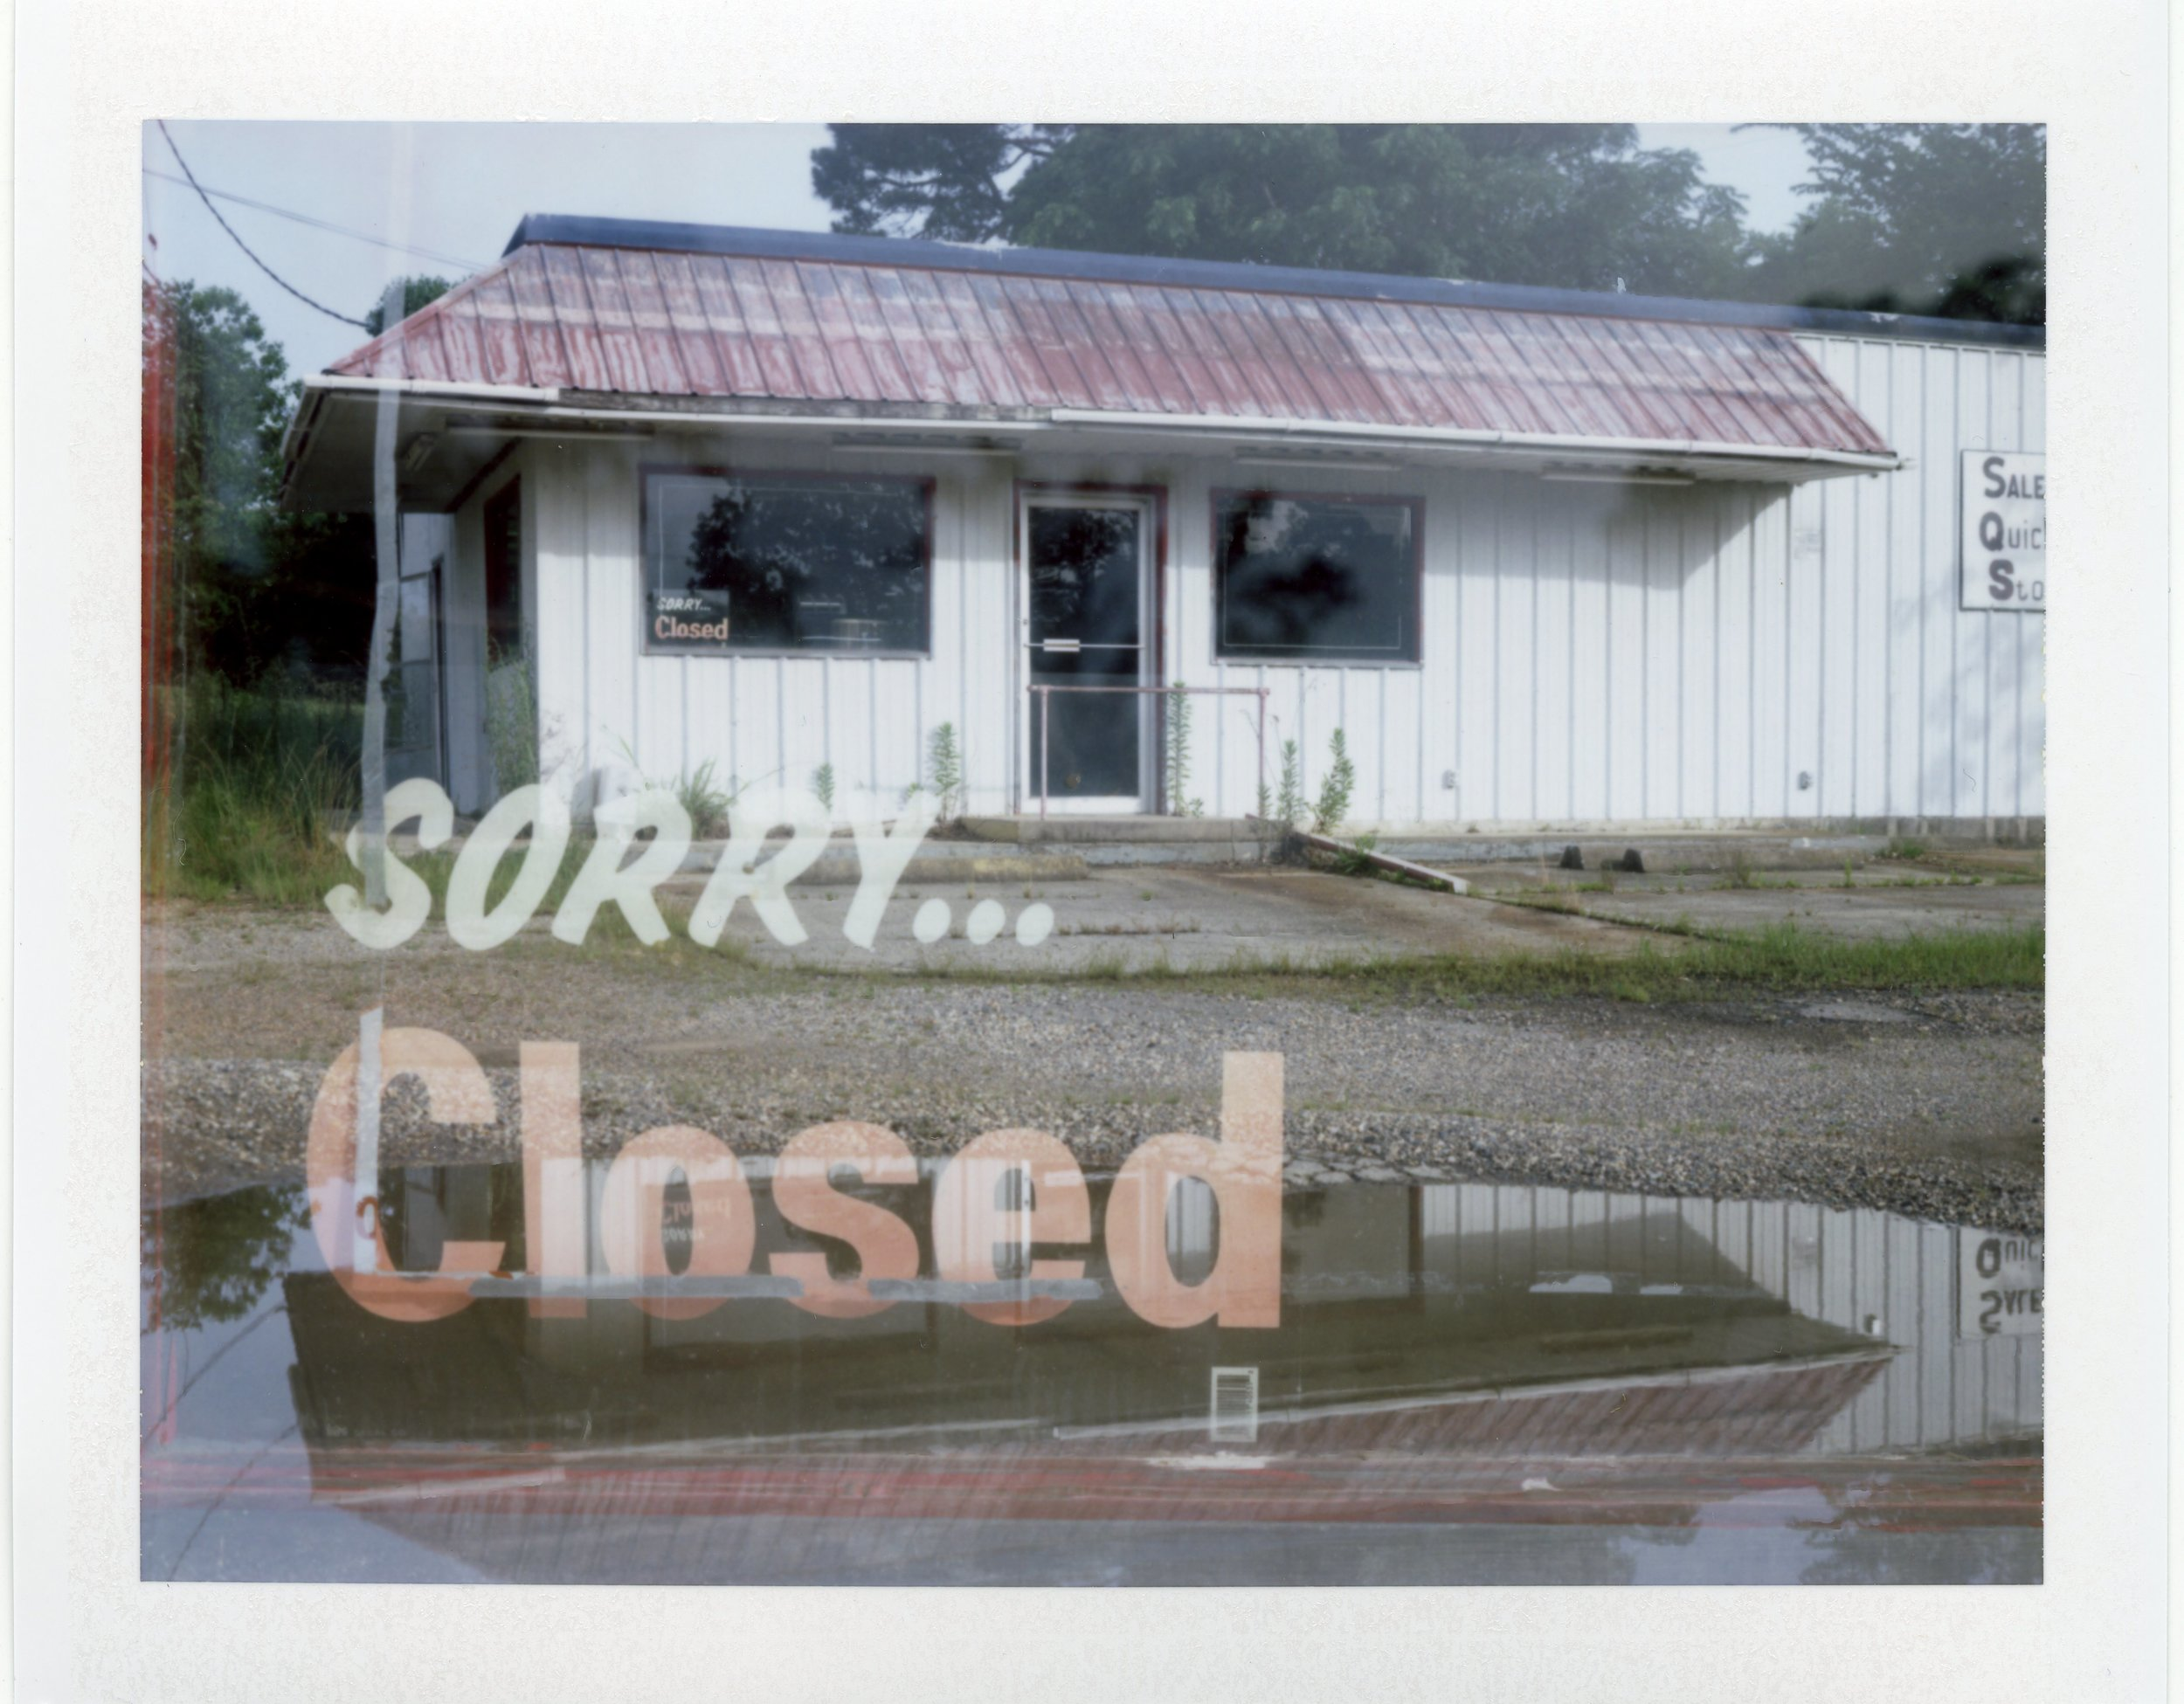 Sorry Closed | Polaroid 110a | Fuji FP100C |  Michael  Mooney